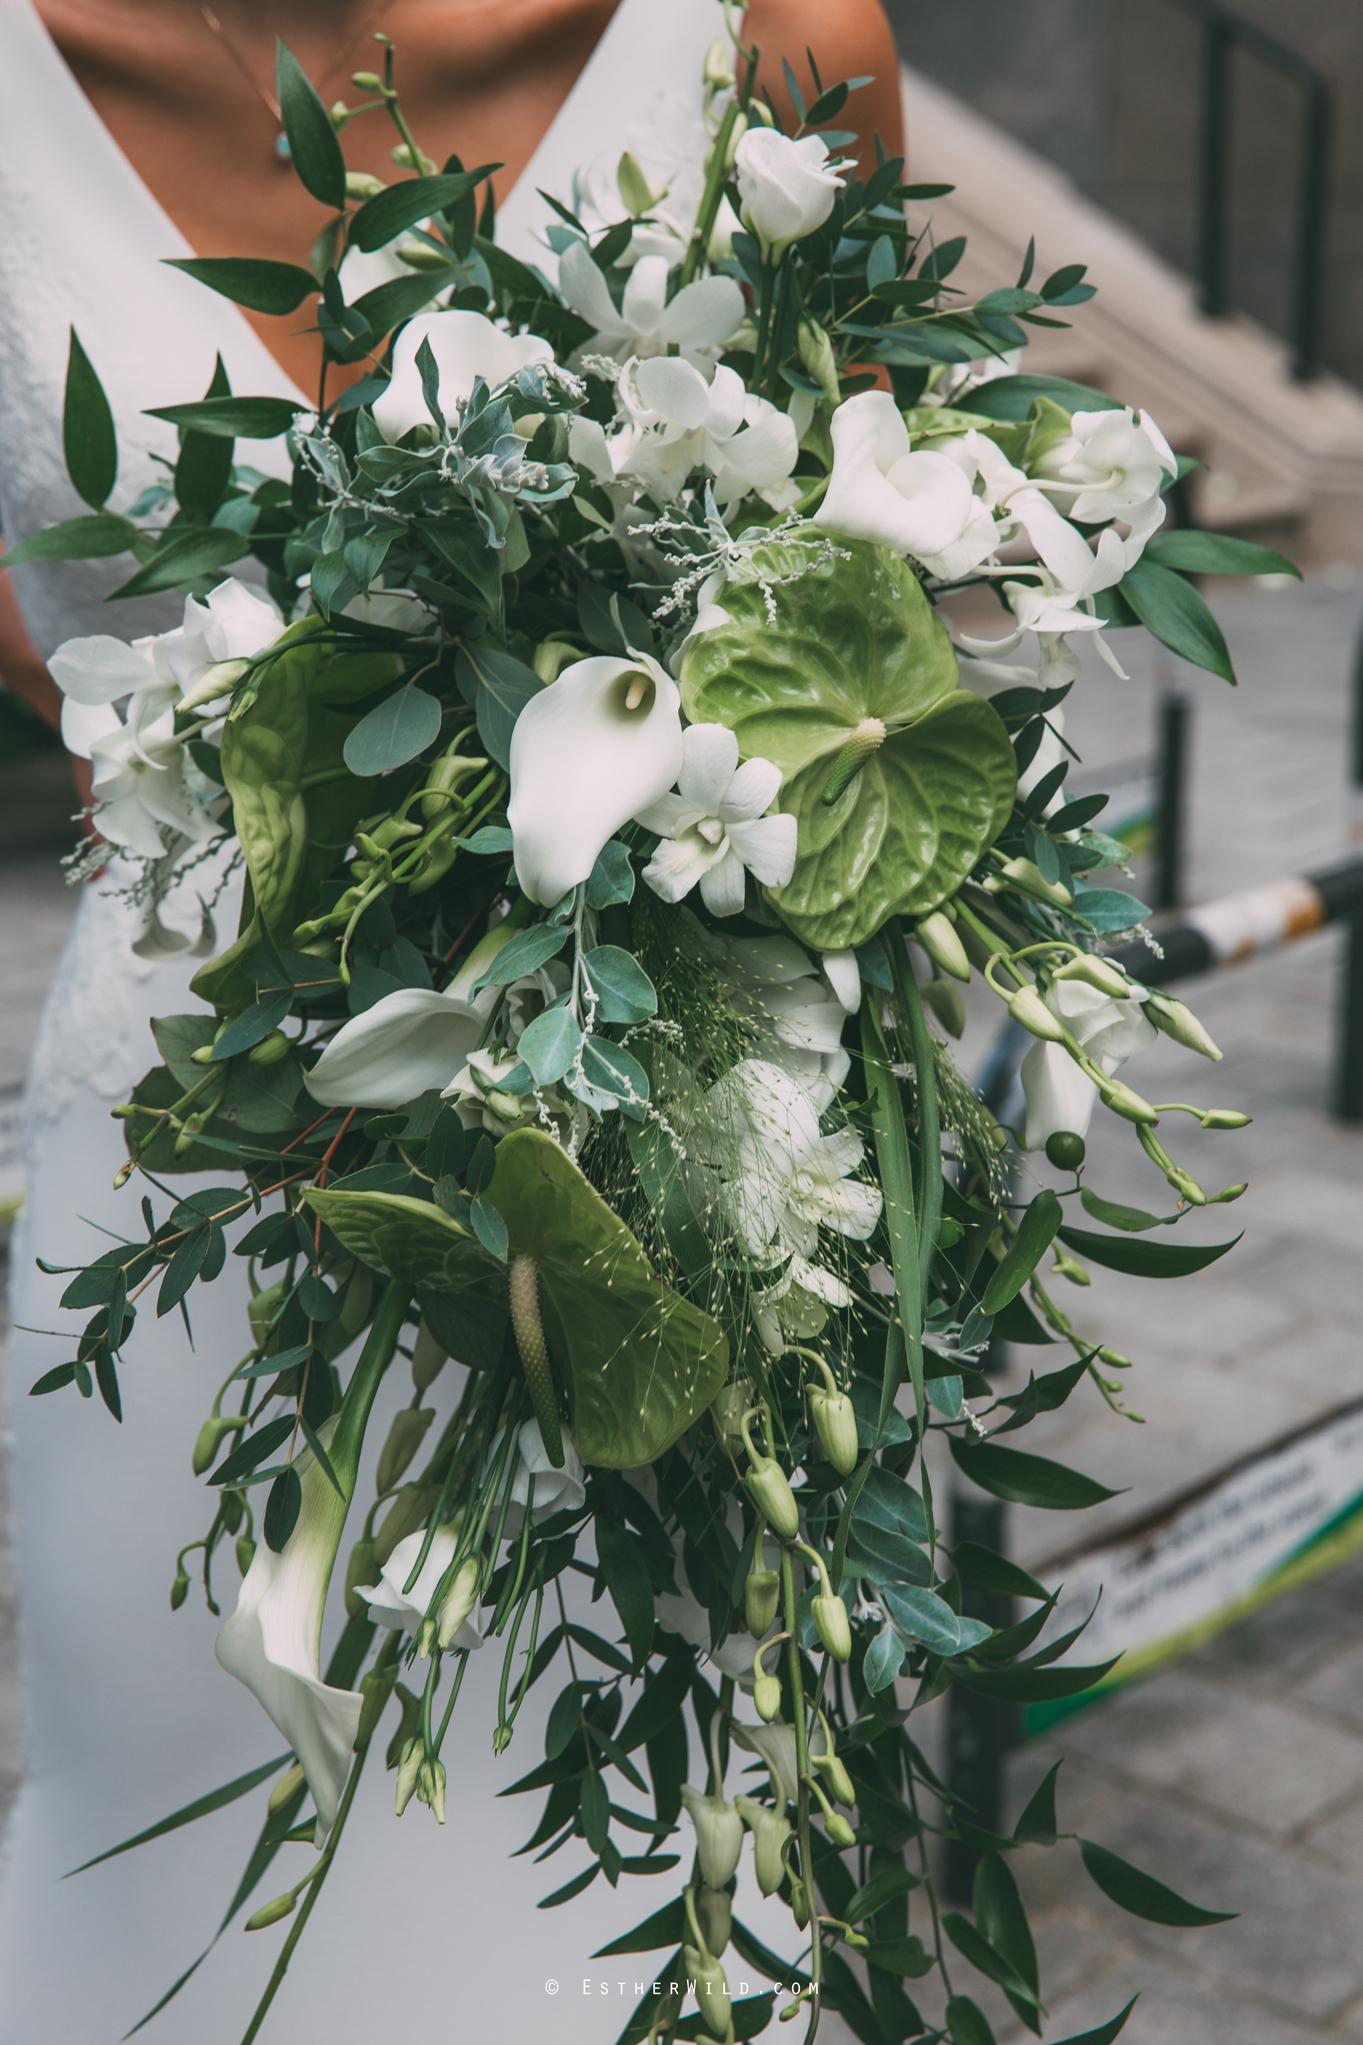 Islington_Town_Hall_Wedding_London_Photographer_Esther_Wild_IMG_5328.jpg